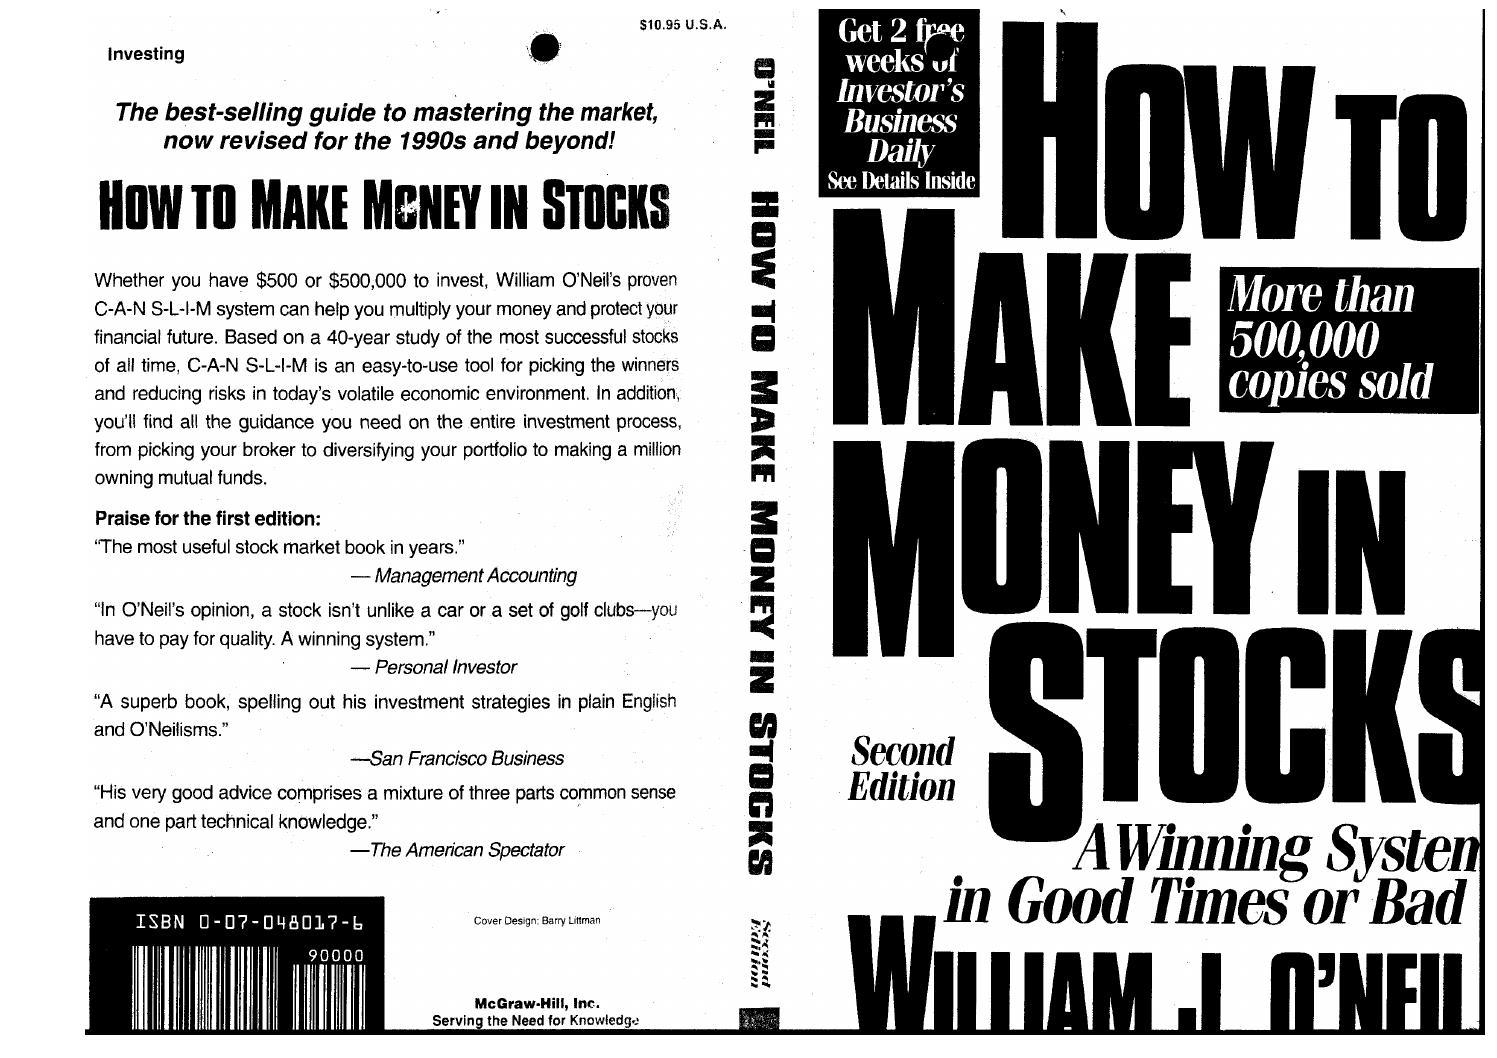 406cf1b70864 William j o neil how to make money in stocks by sivakumar - issuu